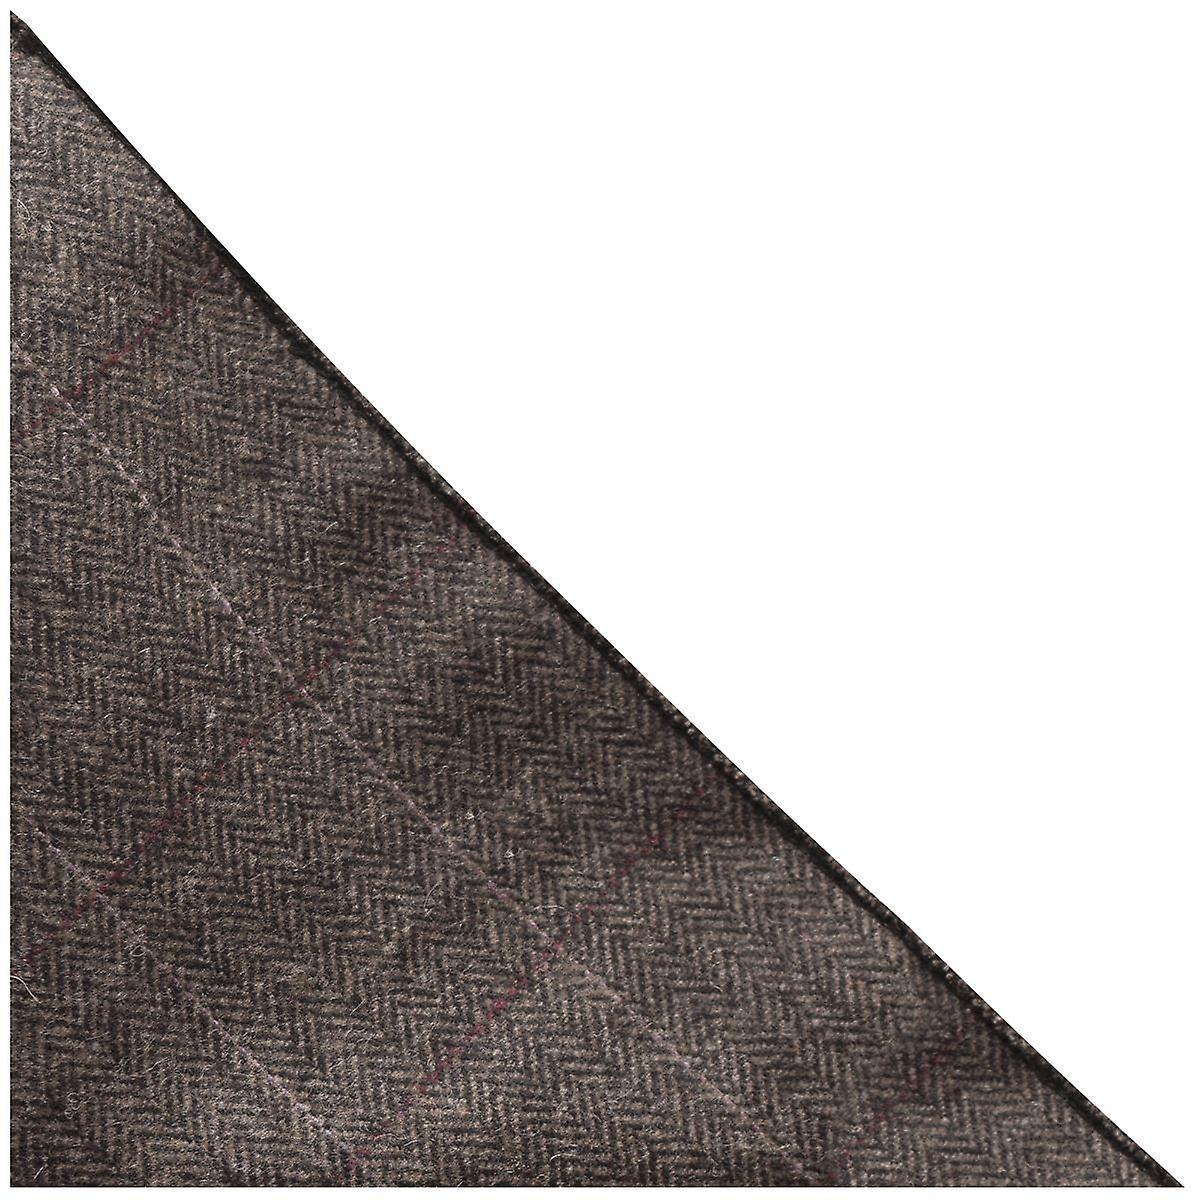 Luxury Herringbone Mocha Brown Pocket Square, Handkerchief